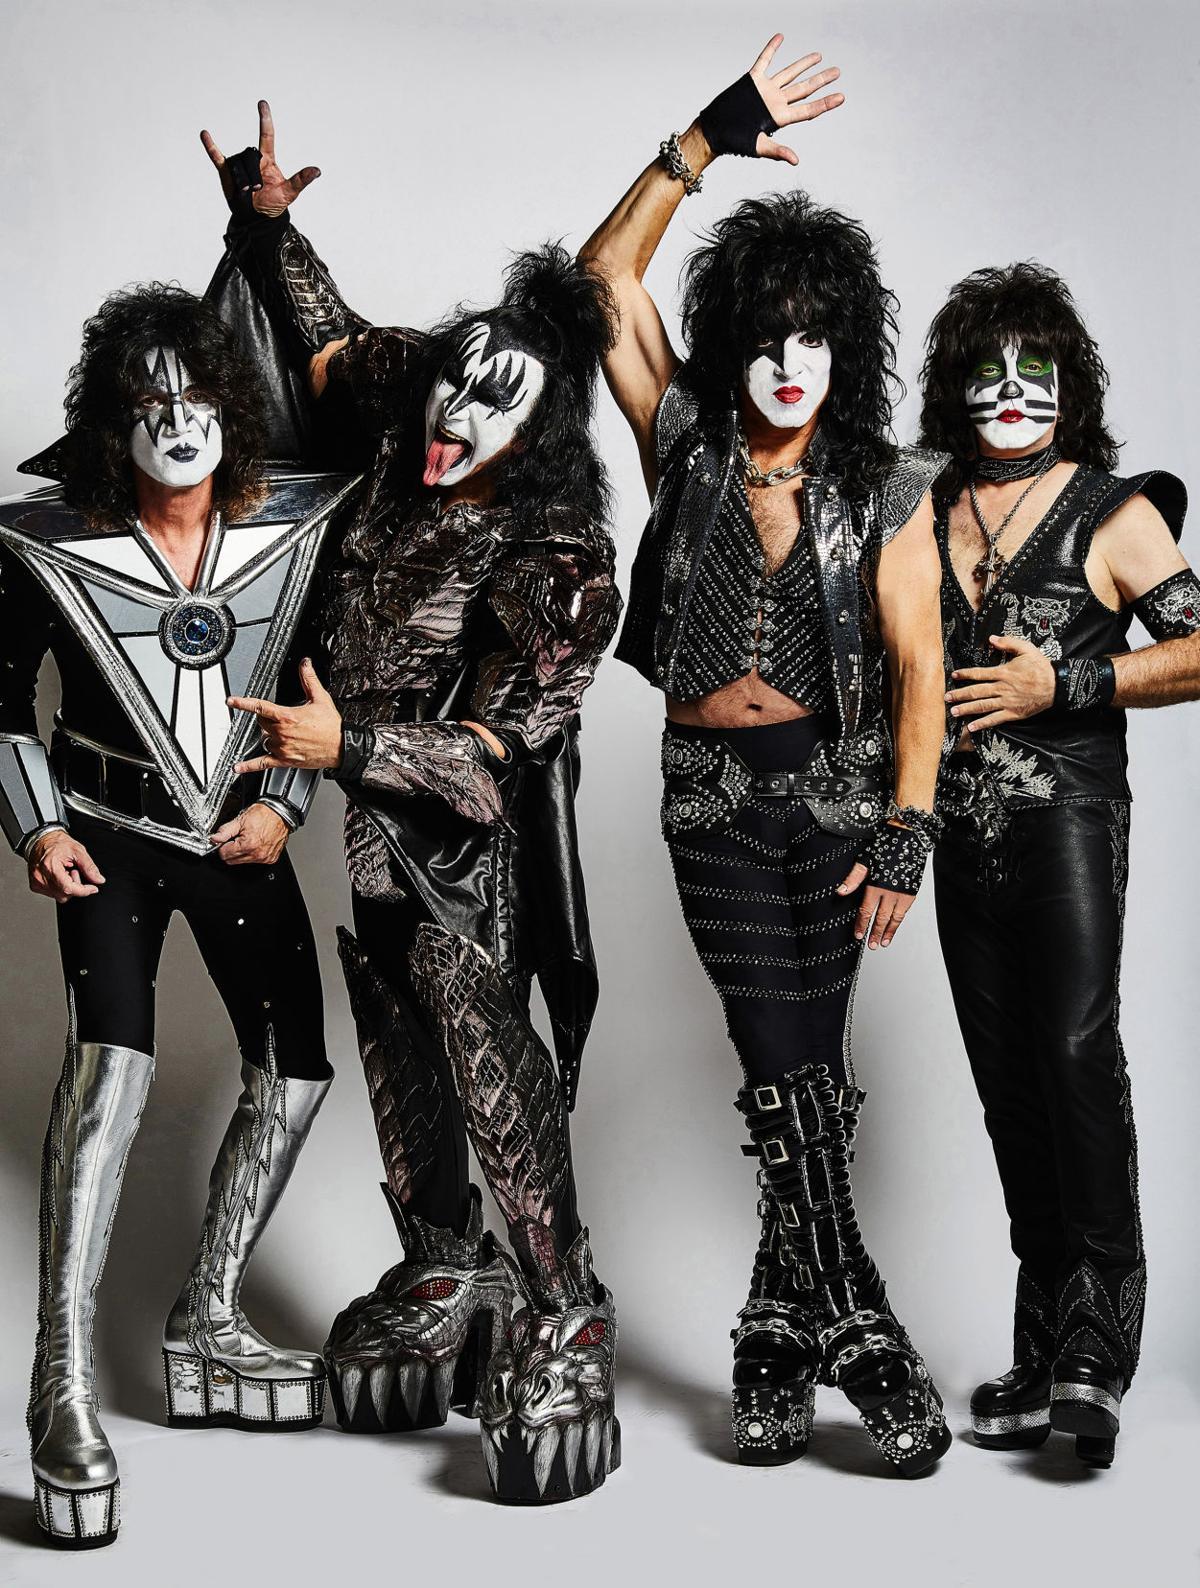 Kiss_JR - photo credit Jen Rosenstein